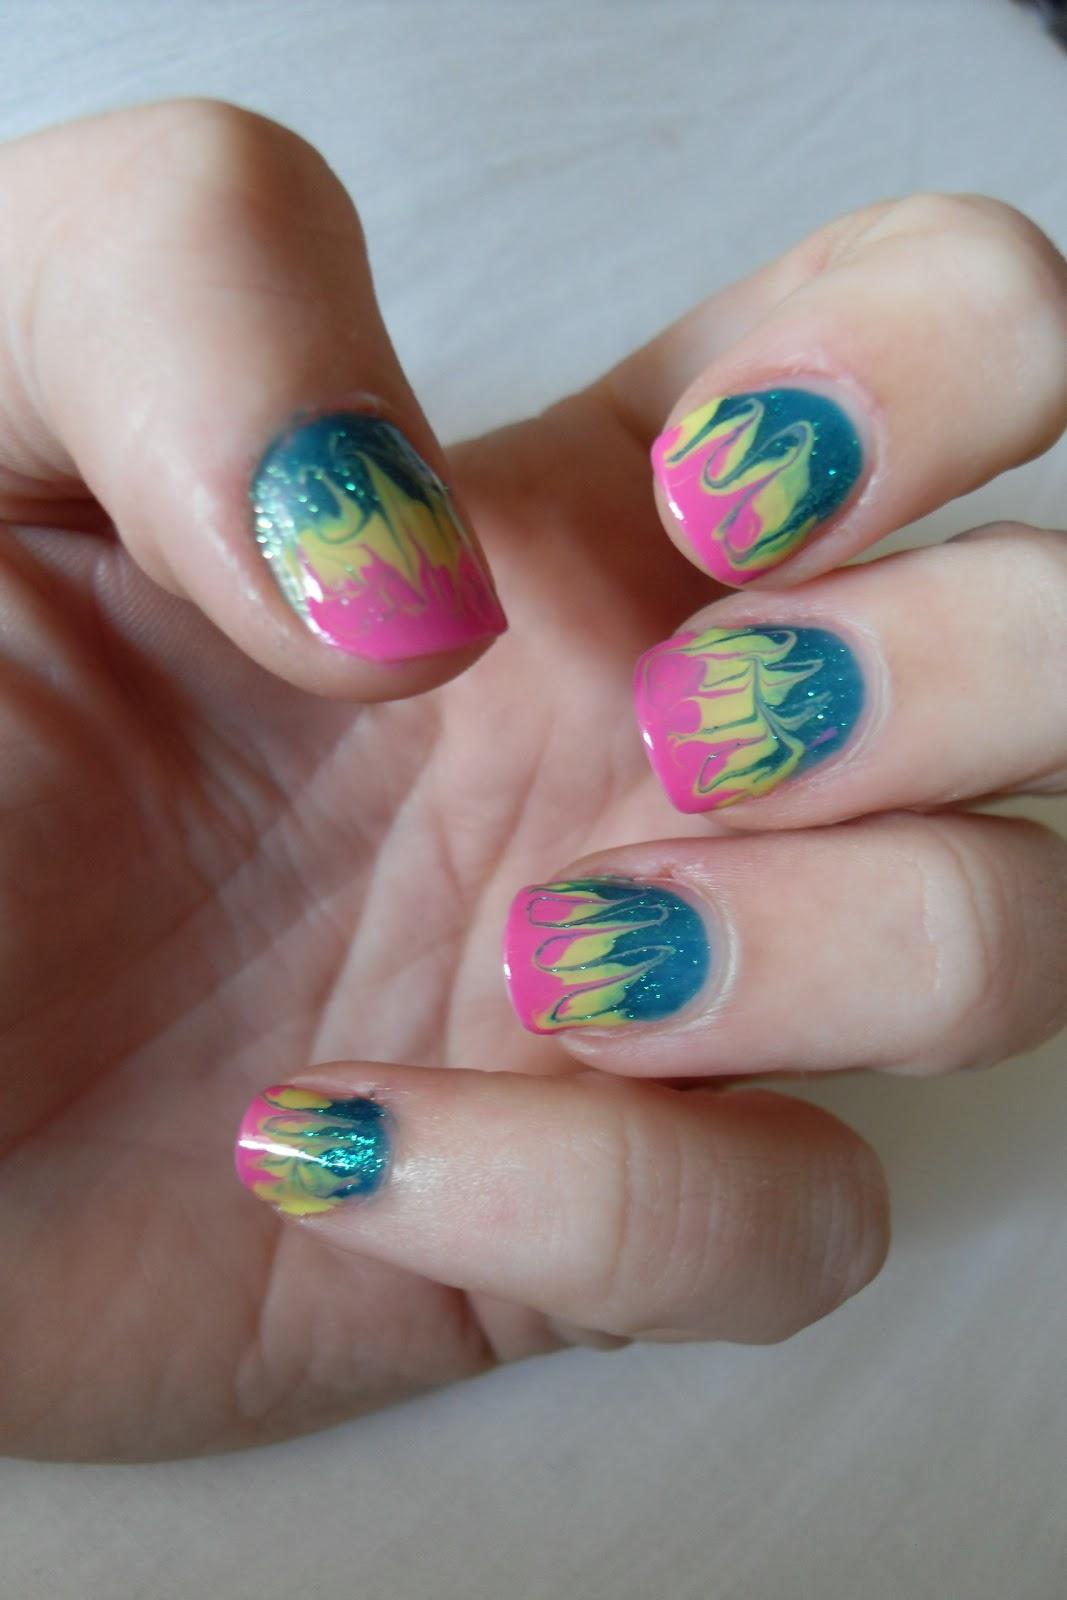 Oooooh Pretty: Tie Dye Nails!